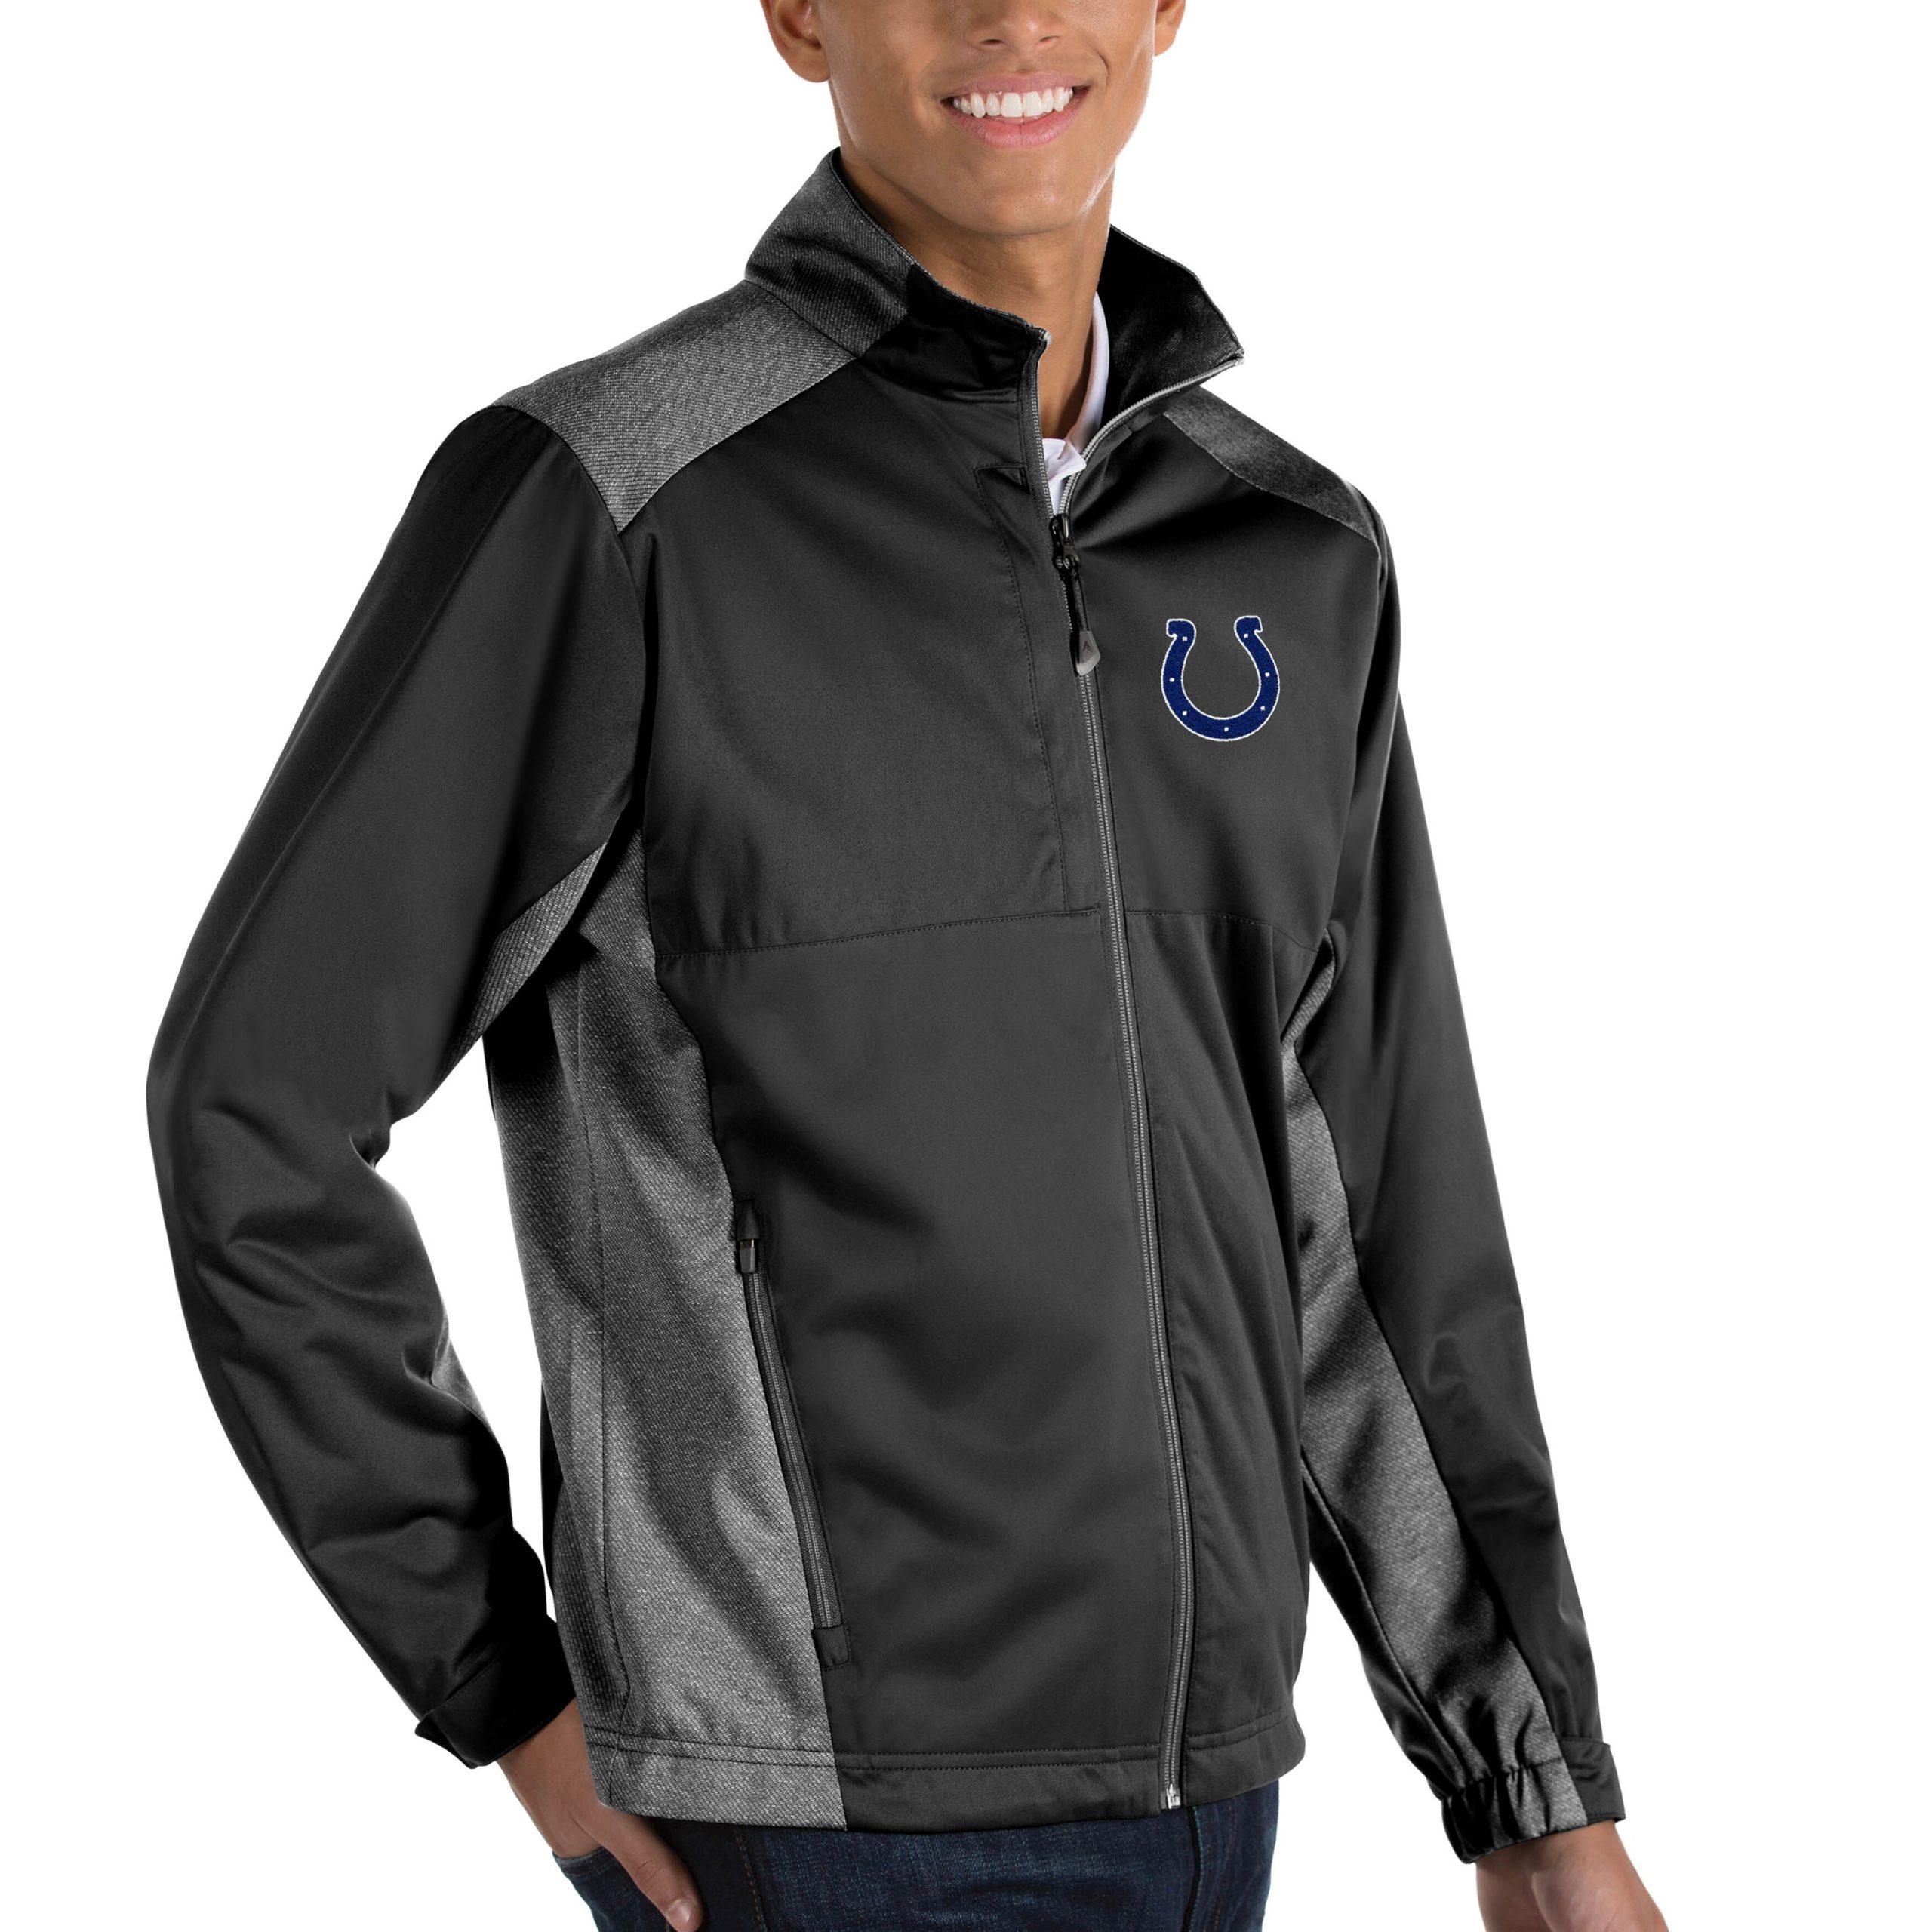 Indianapolis Colts Antigua Revolve Big & Tall Full-Zip Jacket - Heather Black